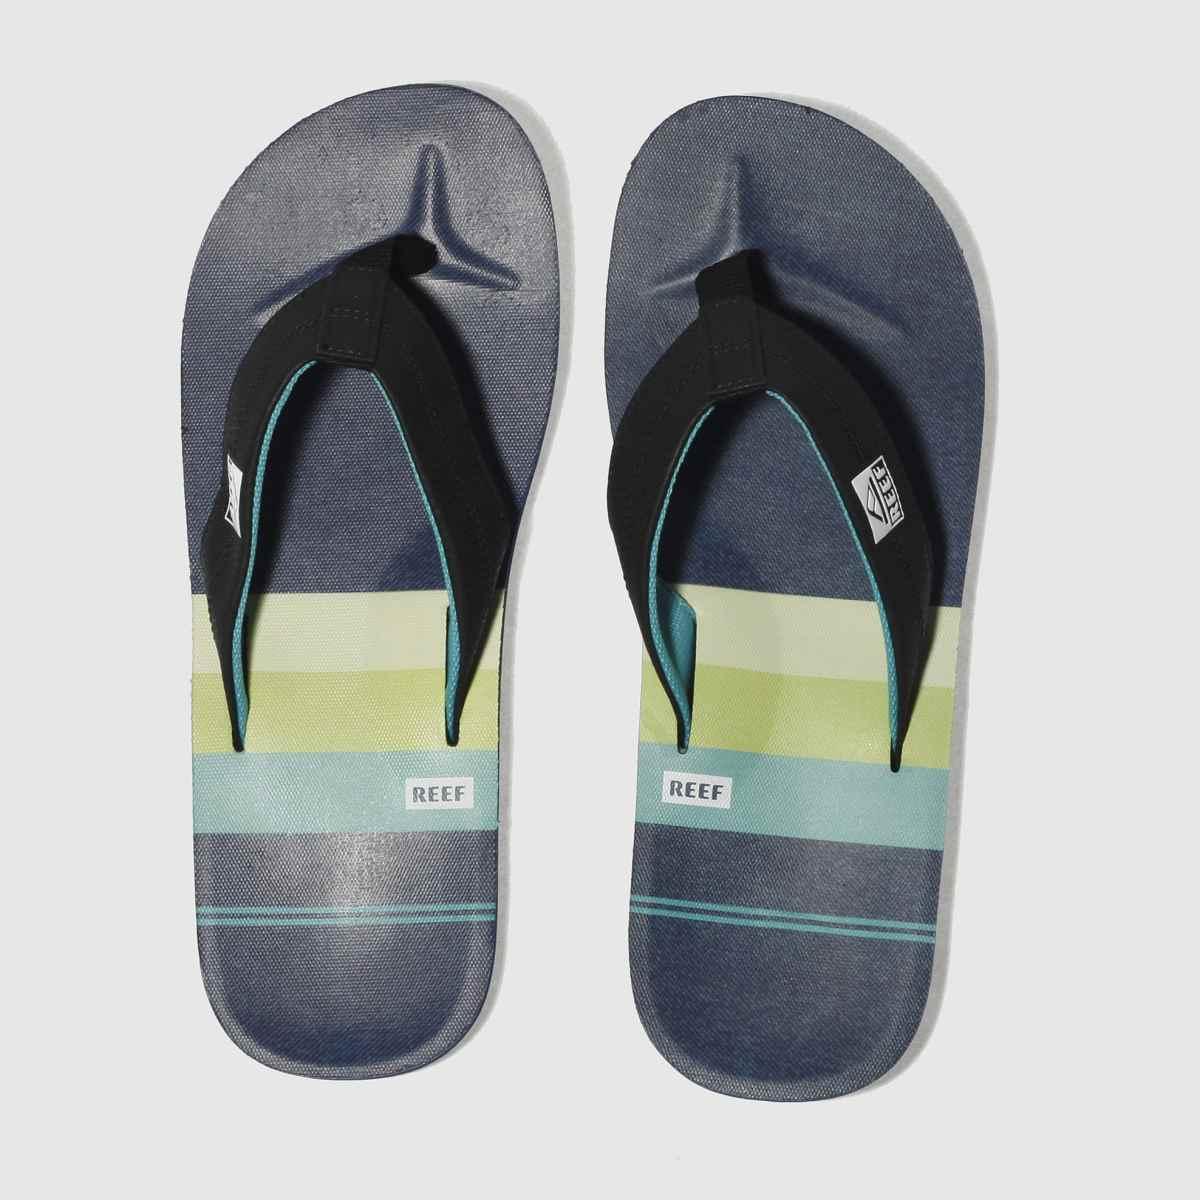 Reef Blue Ht Prints Sandals